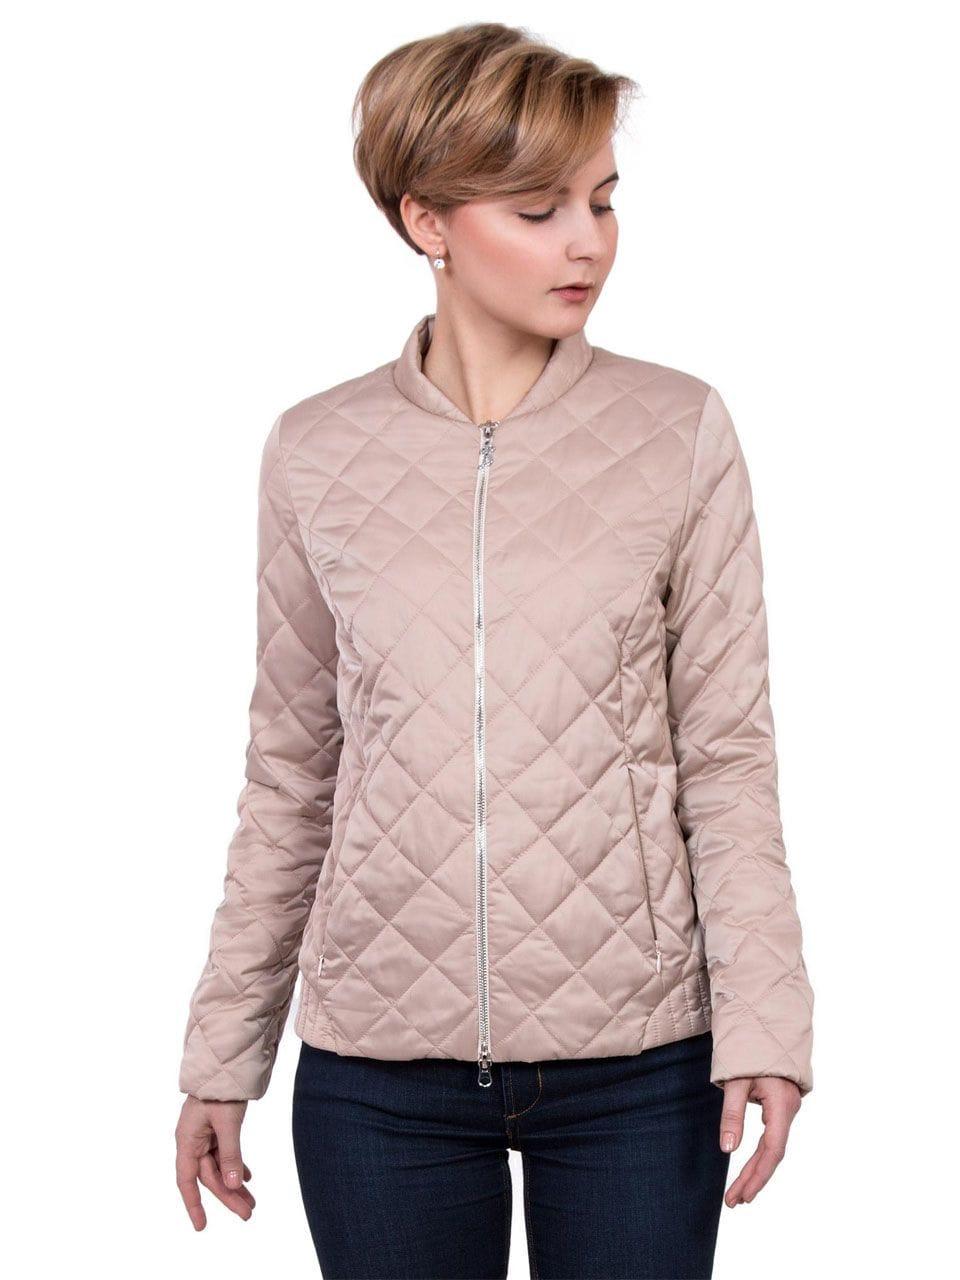 Короткая стёганая женская куртка цвета пудры J-Splash